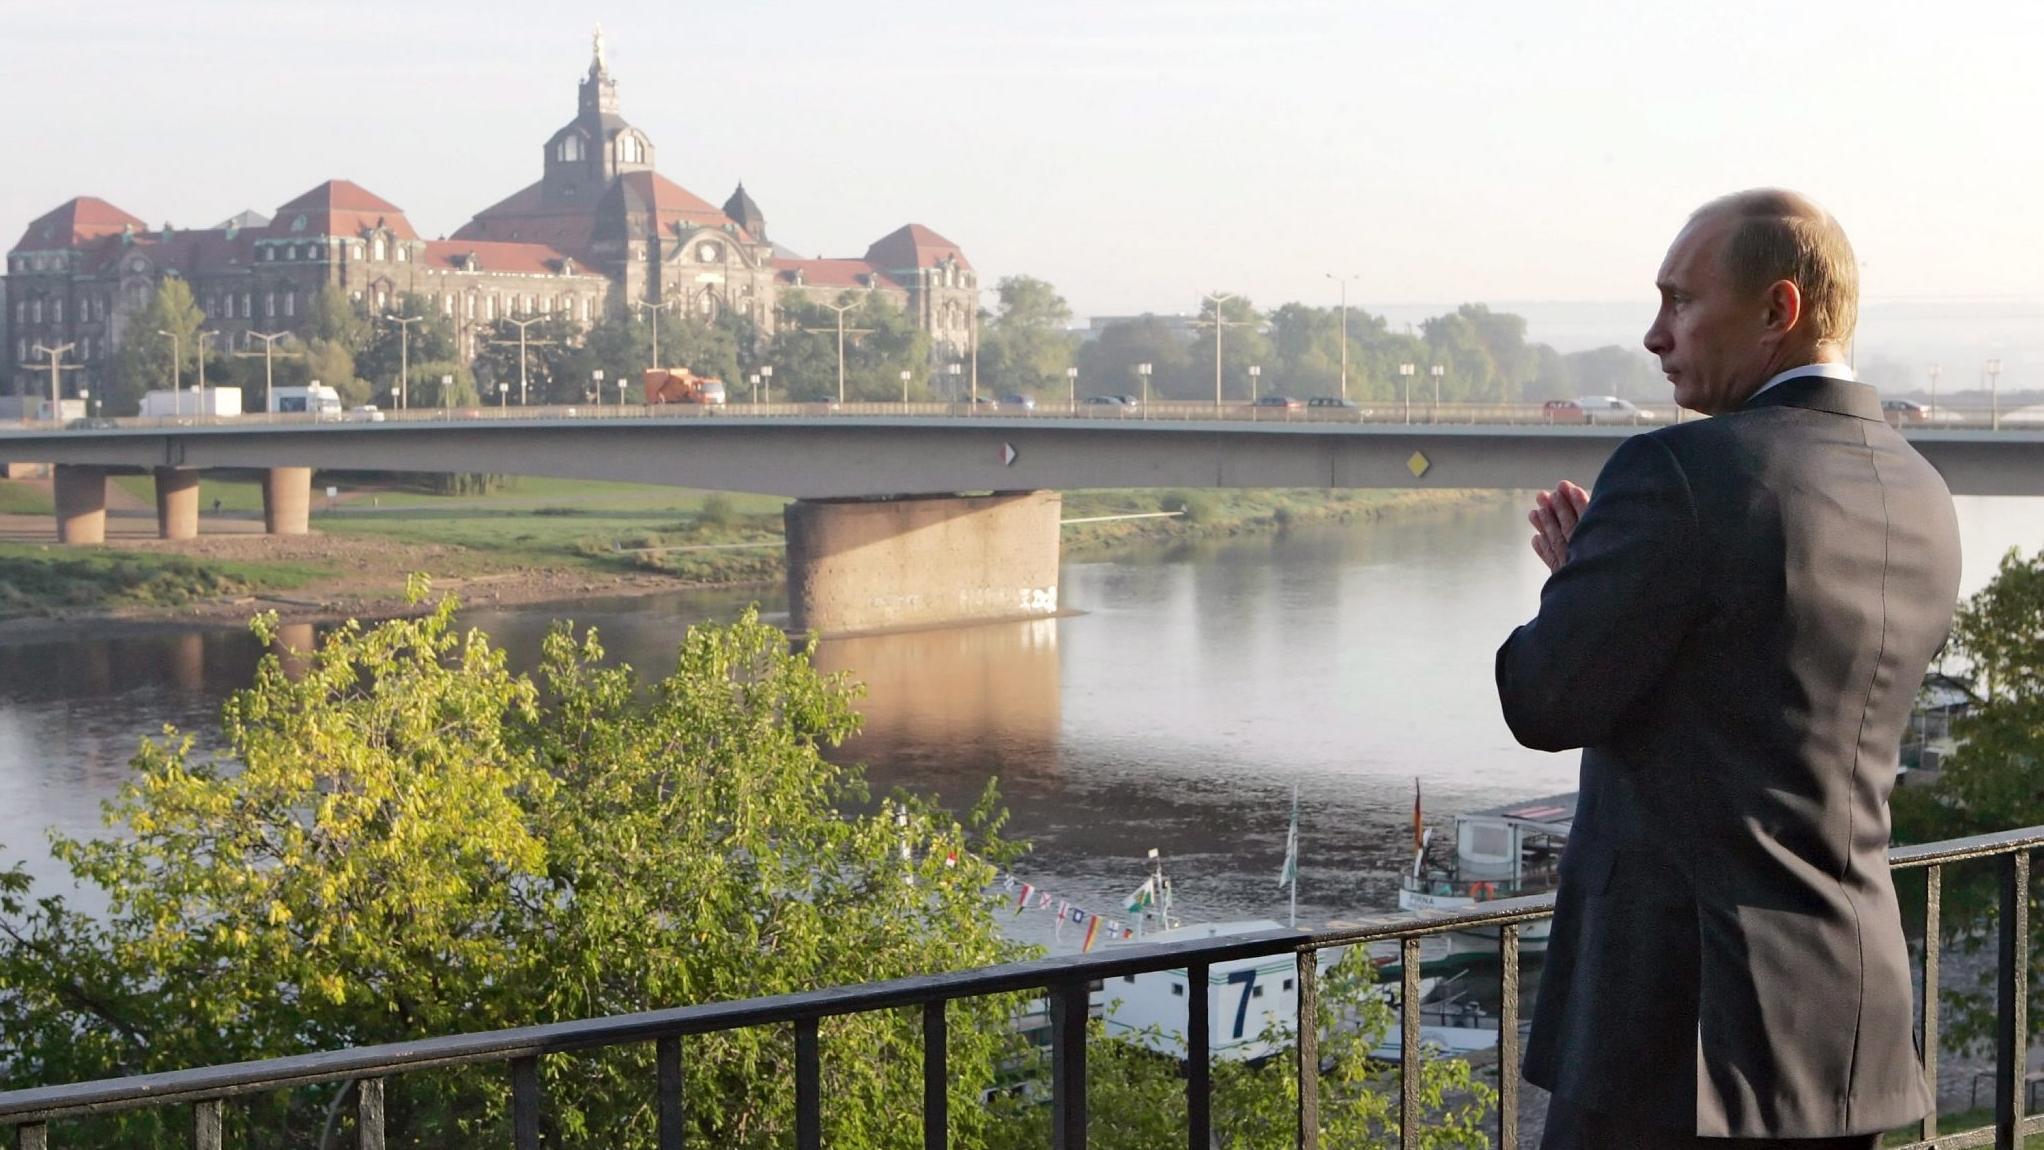 11.10.2006, Dresden: Russlands Präsident Wladimir Putin steht am Dresdner Terrassenufer.